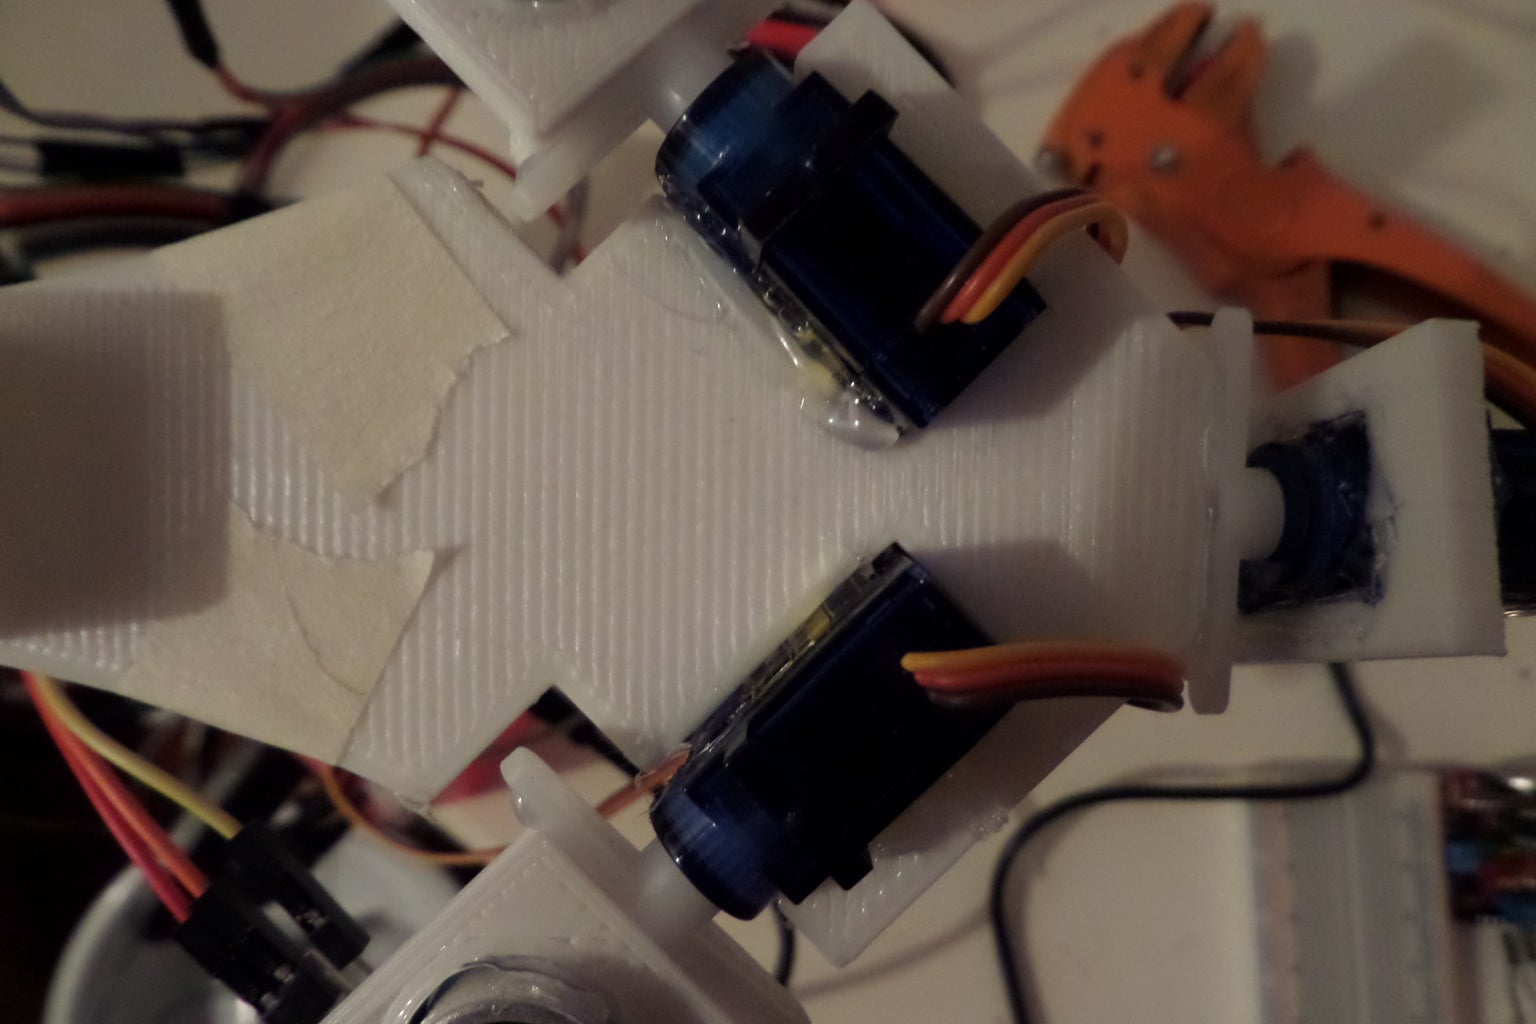 Glue the Parts